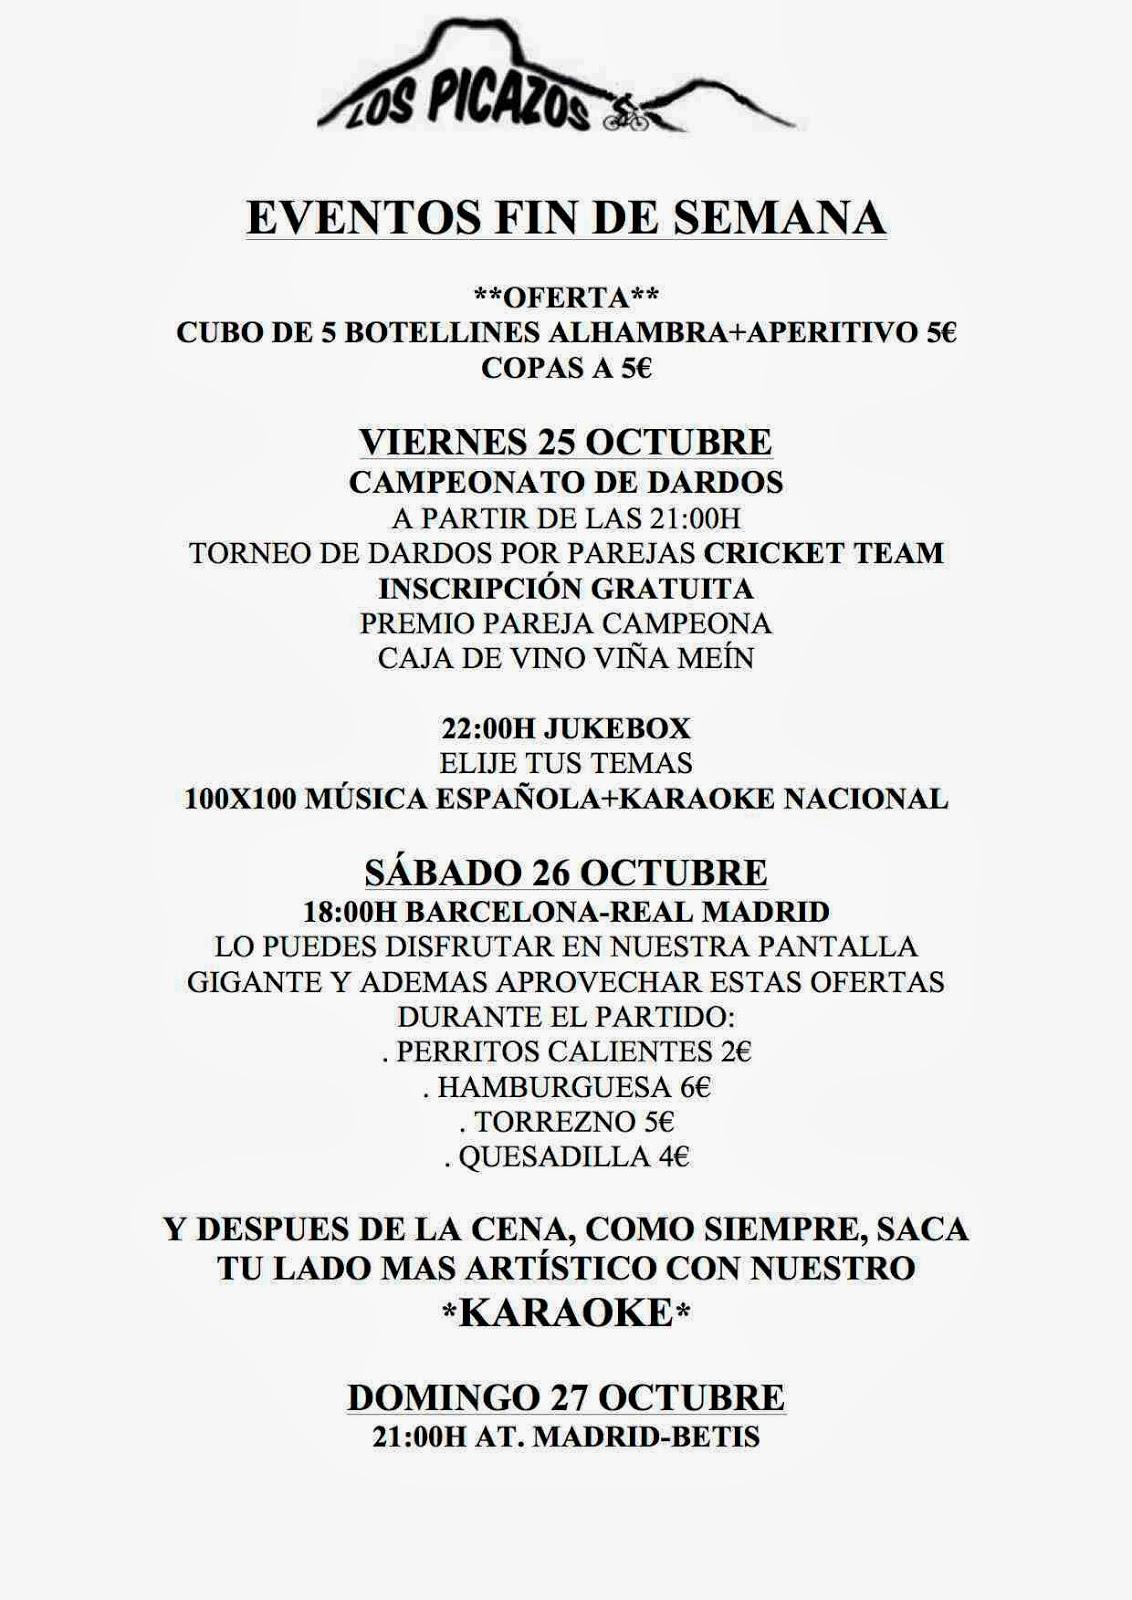 Los picazos restaurante octubre 2013 for Eventos en barcelona este fin de semana